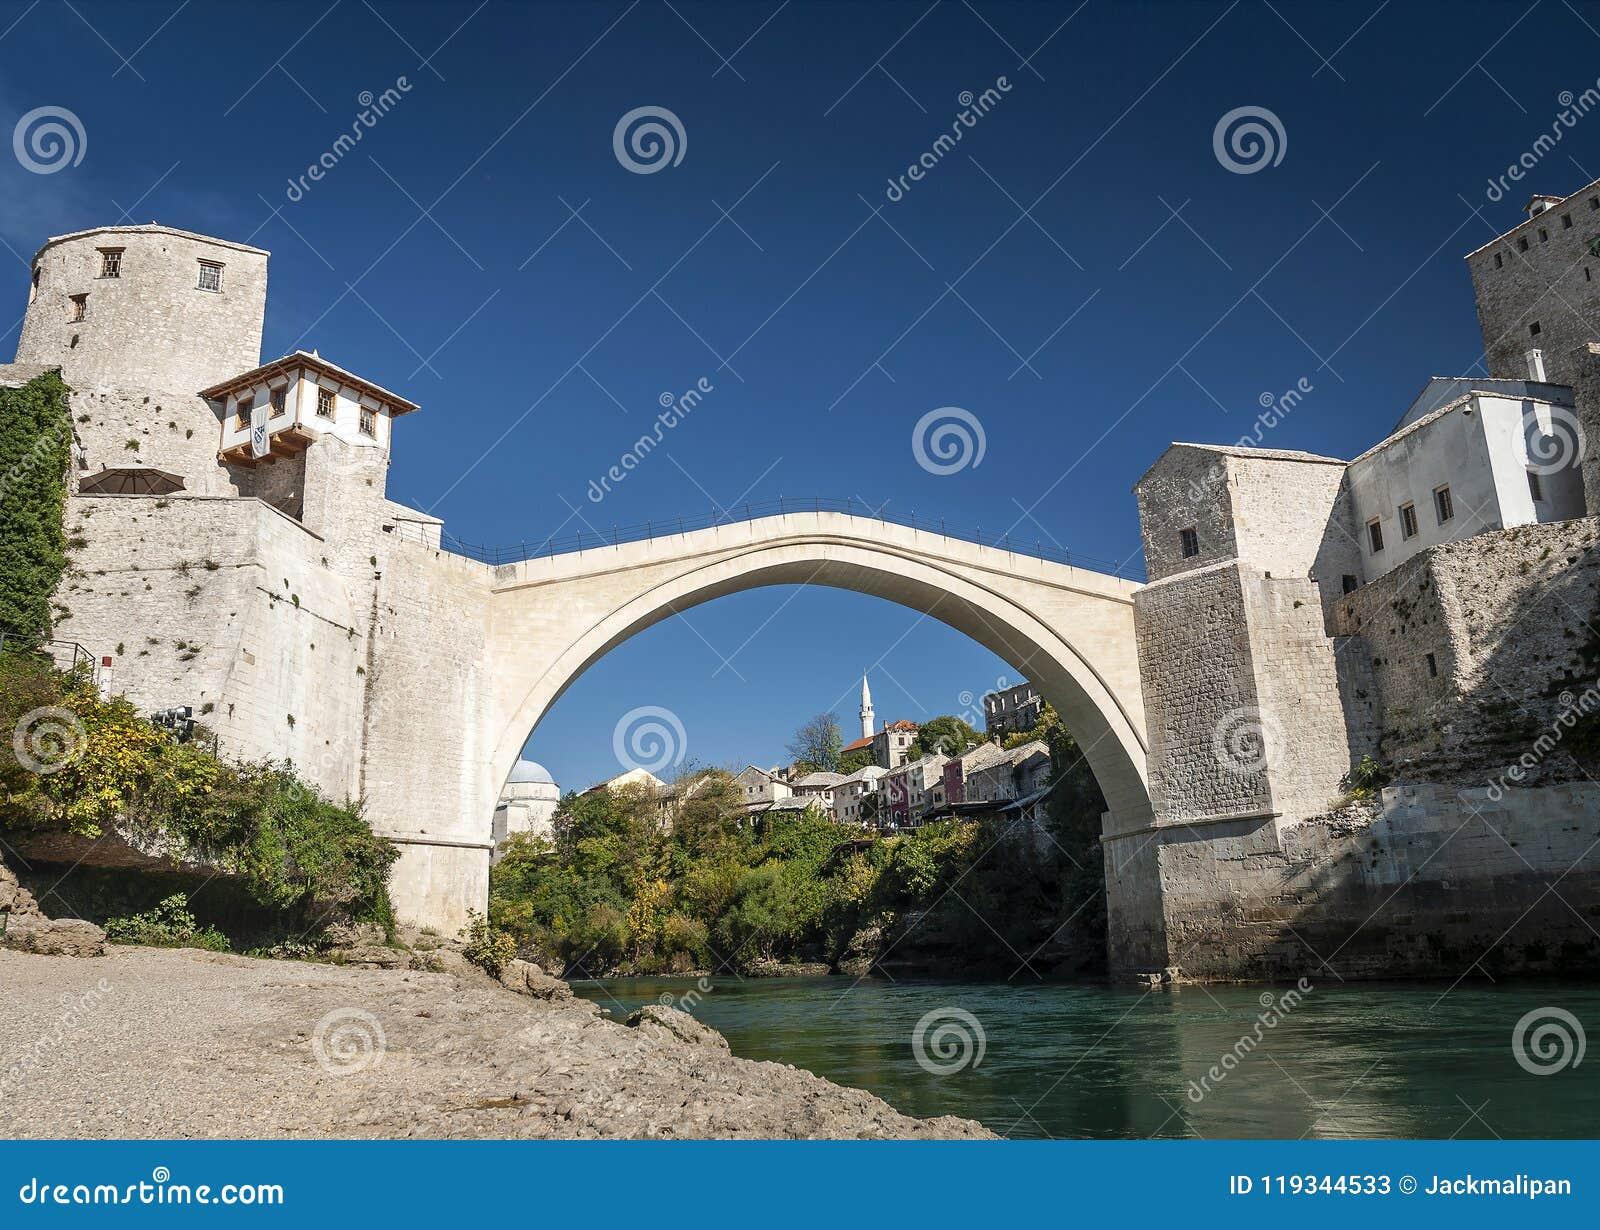 Old bridge famous landmark in mostar town bosnia and herzegovina